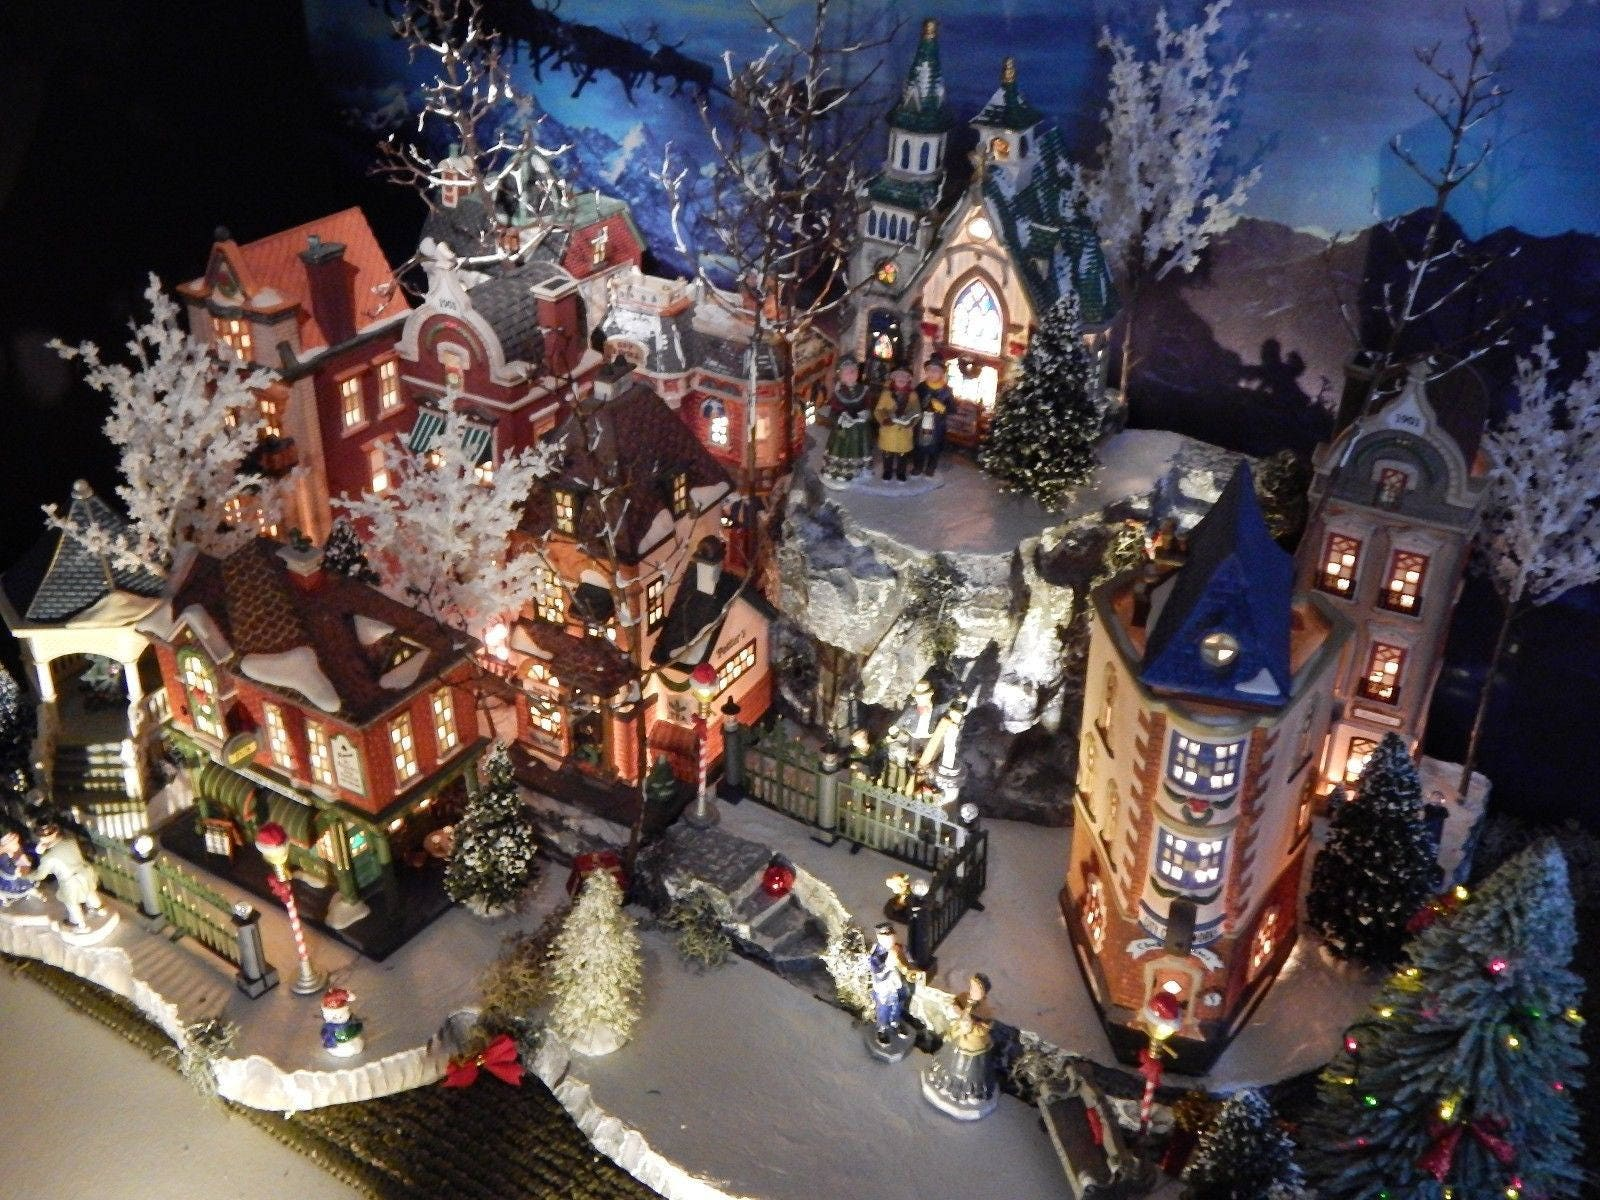 Department 56 Christmas Village Display.Xdeep Multi Level 64 Christmas Village Display Platform Base Dept 56 Lemax Miniature City Fsmj